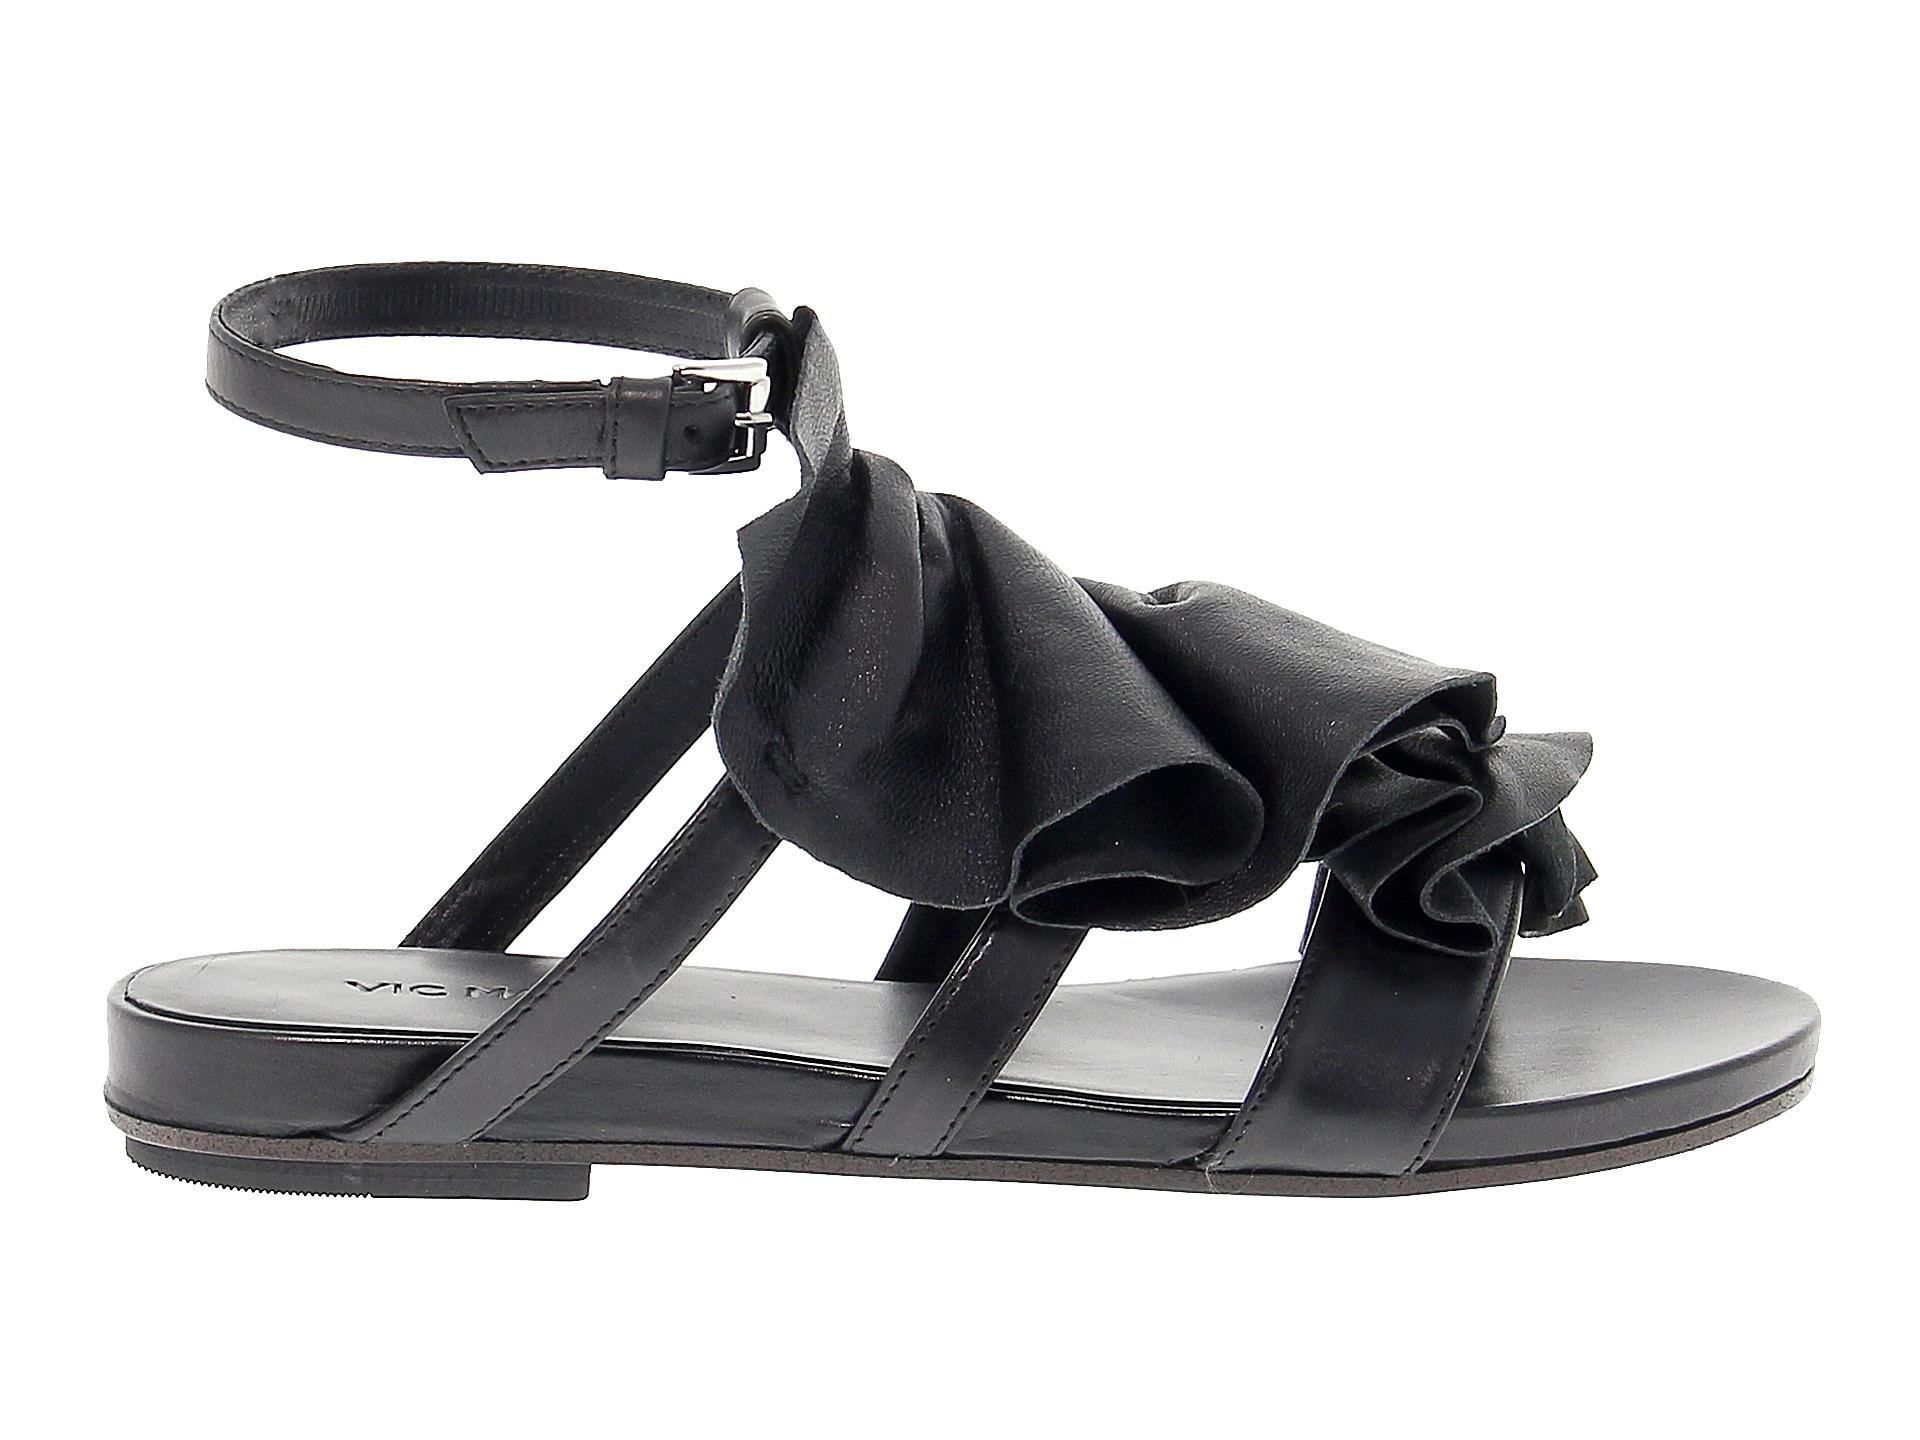 Sandalo basso Vic Matie ALAB in pelle